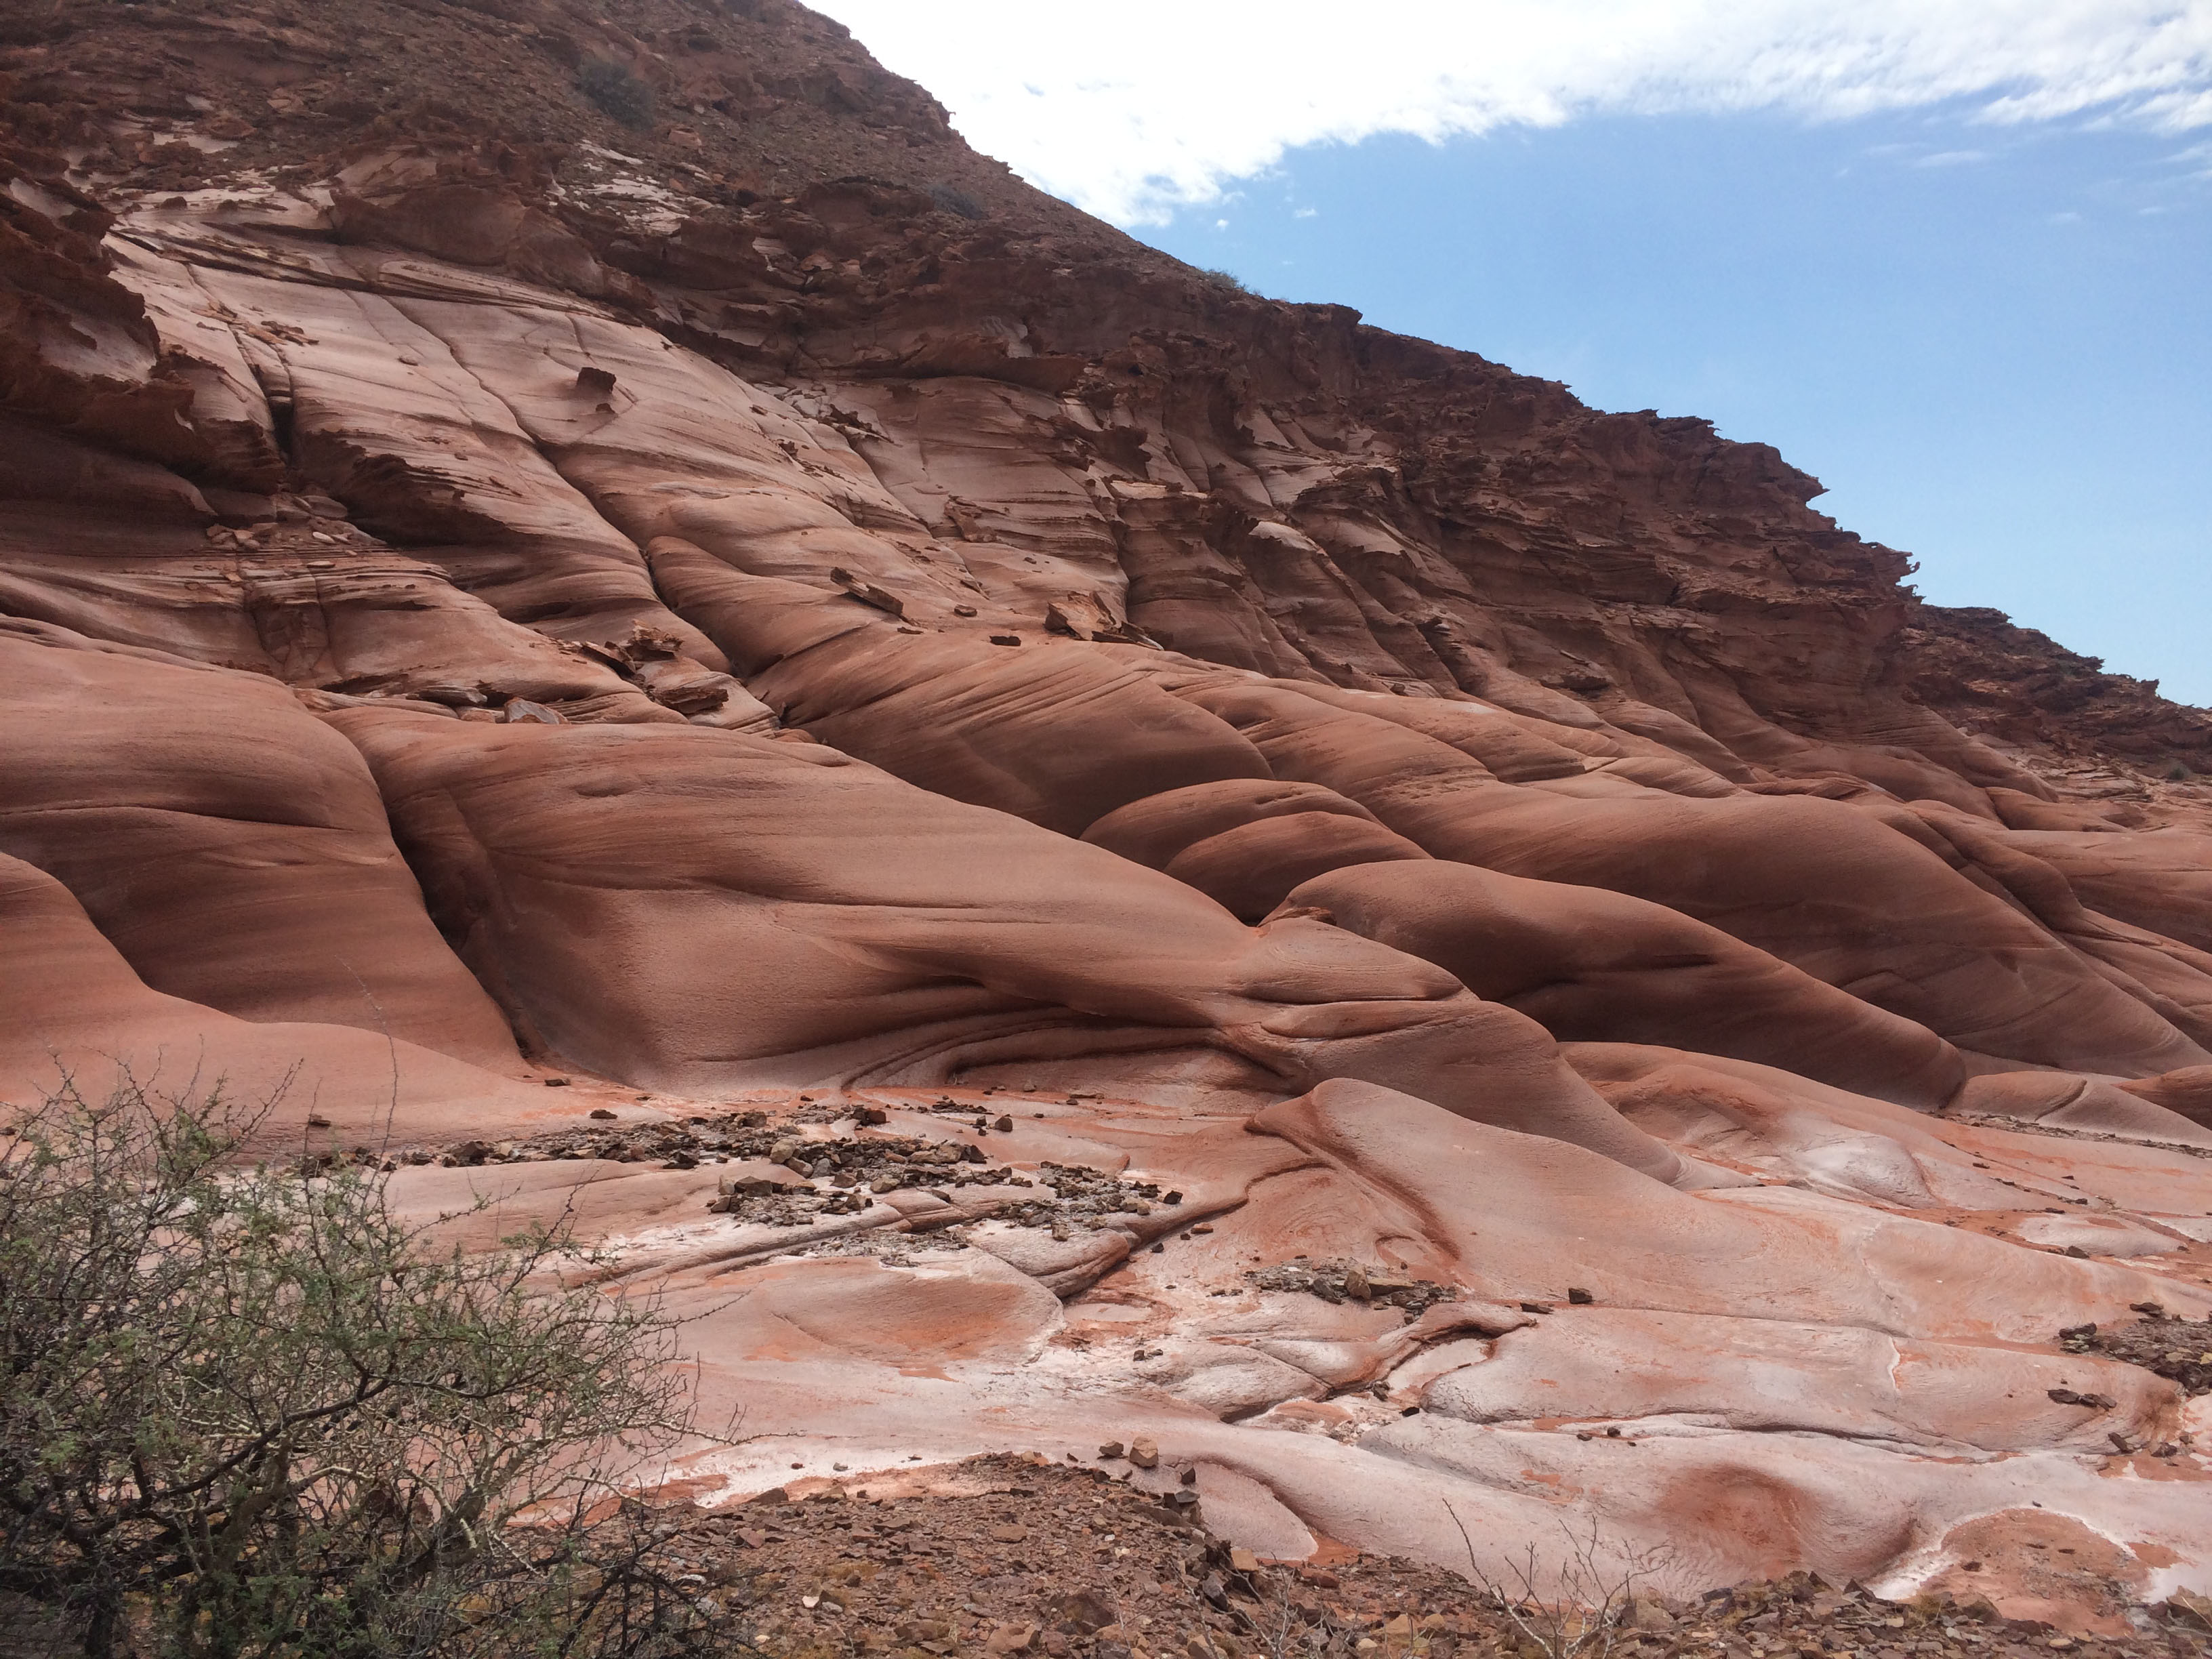 LG Red rocks